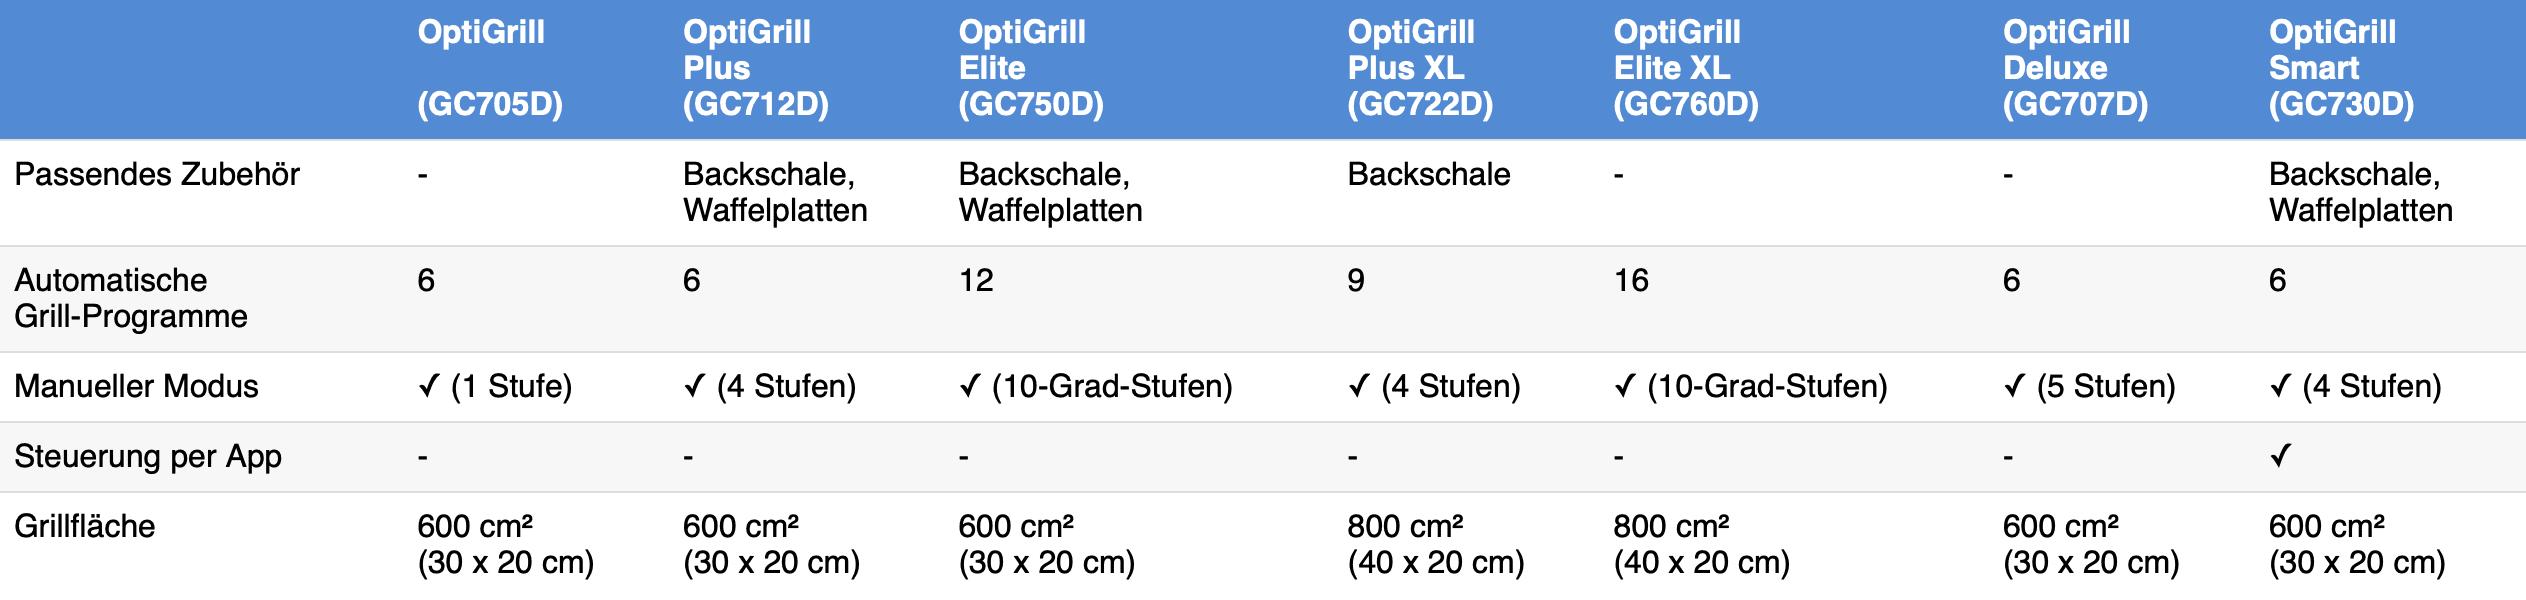 Tefal OptiGrill Modelle Vergleich Unterschiede Februar 2021